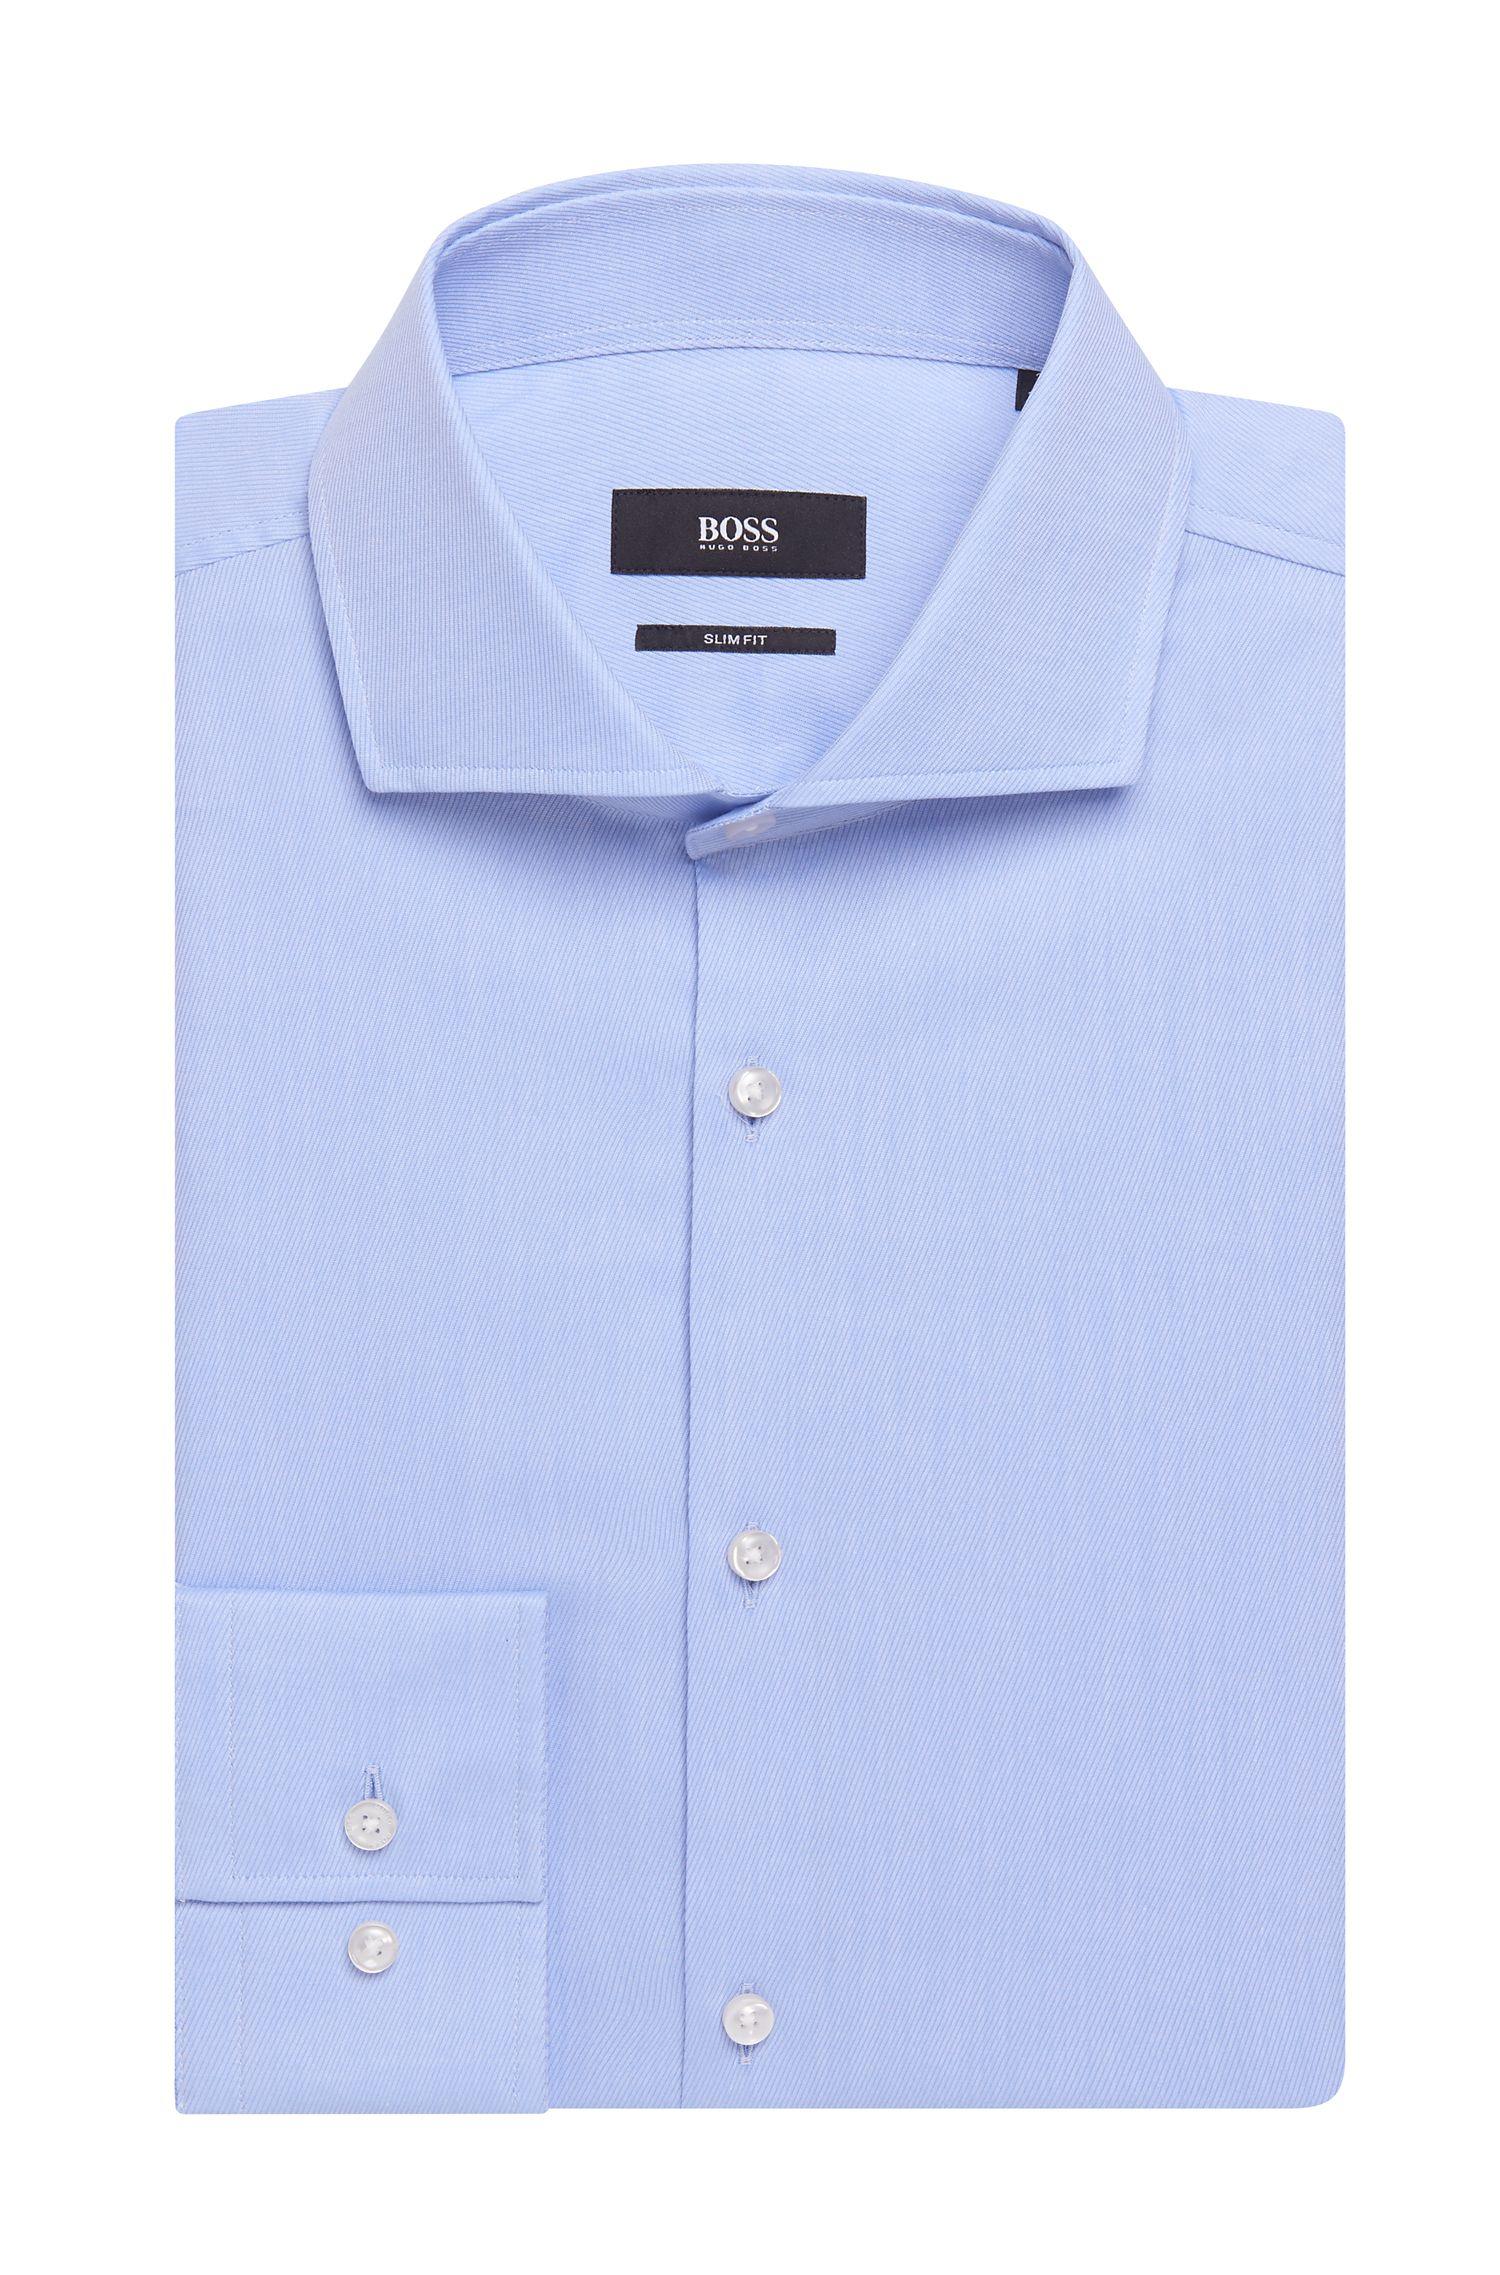 'Jason' | Slim Fit, Pindot Traveler Cotton Dress Shirt